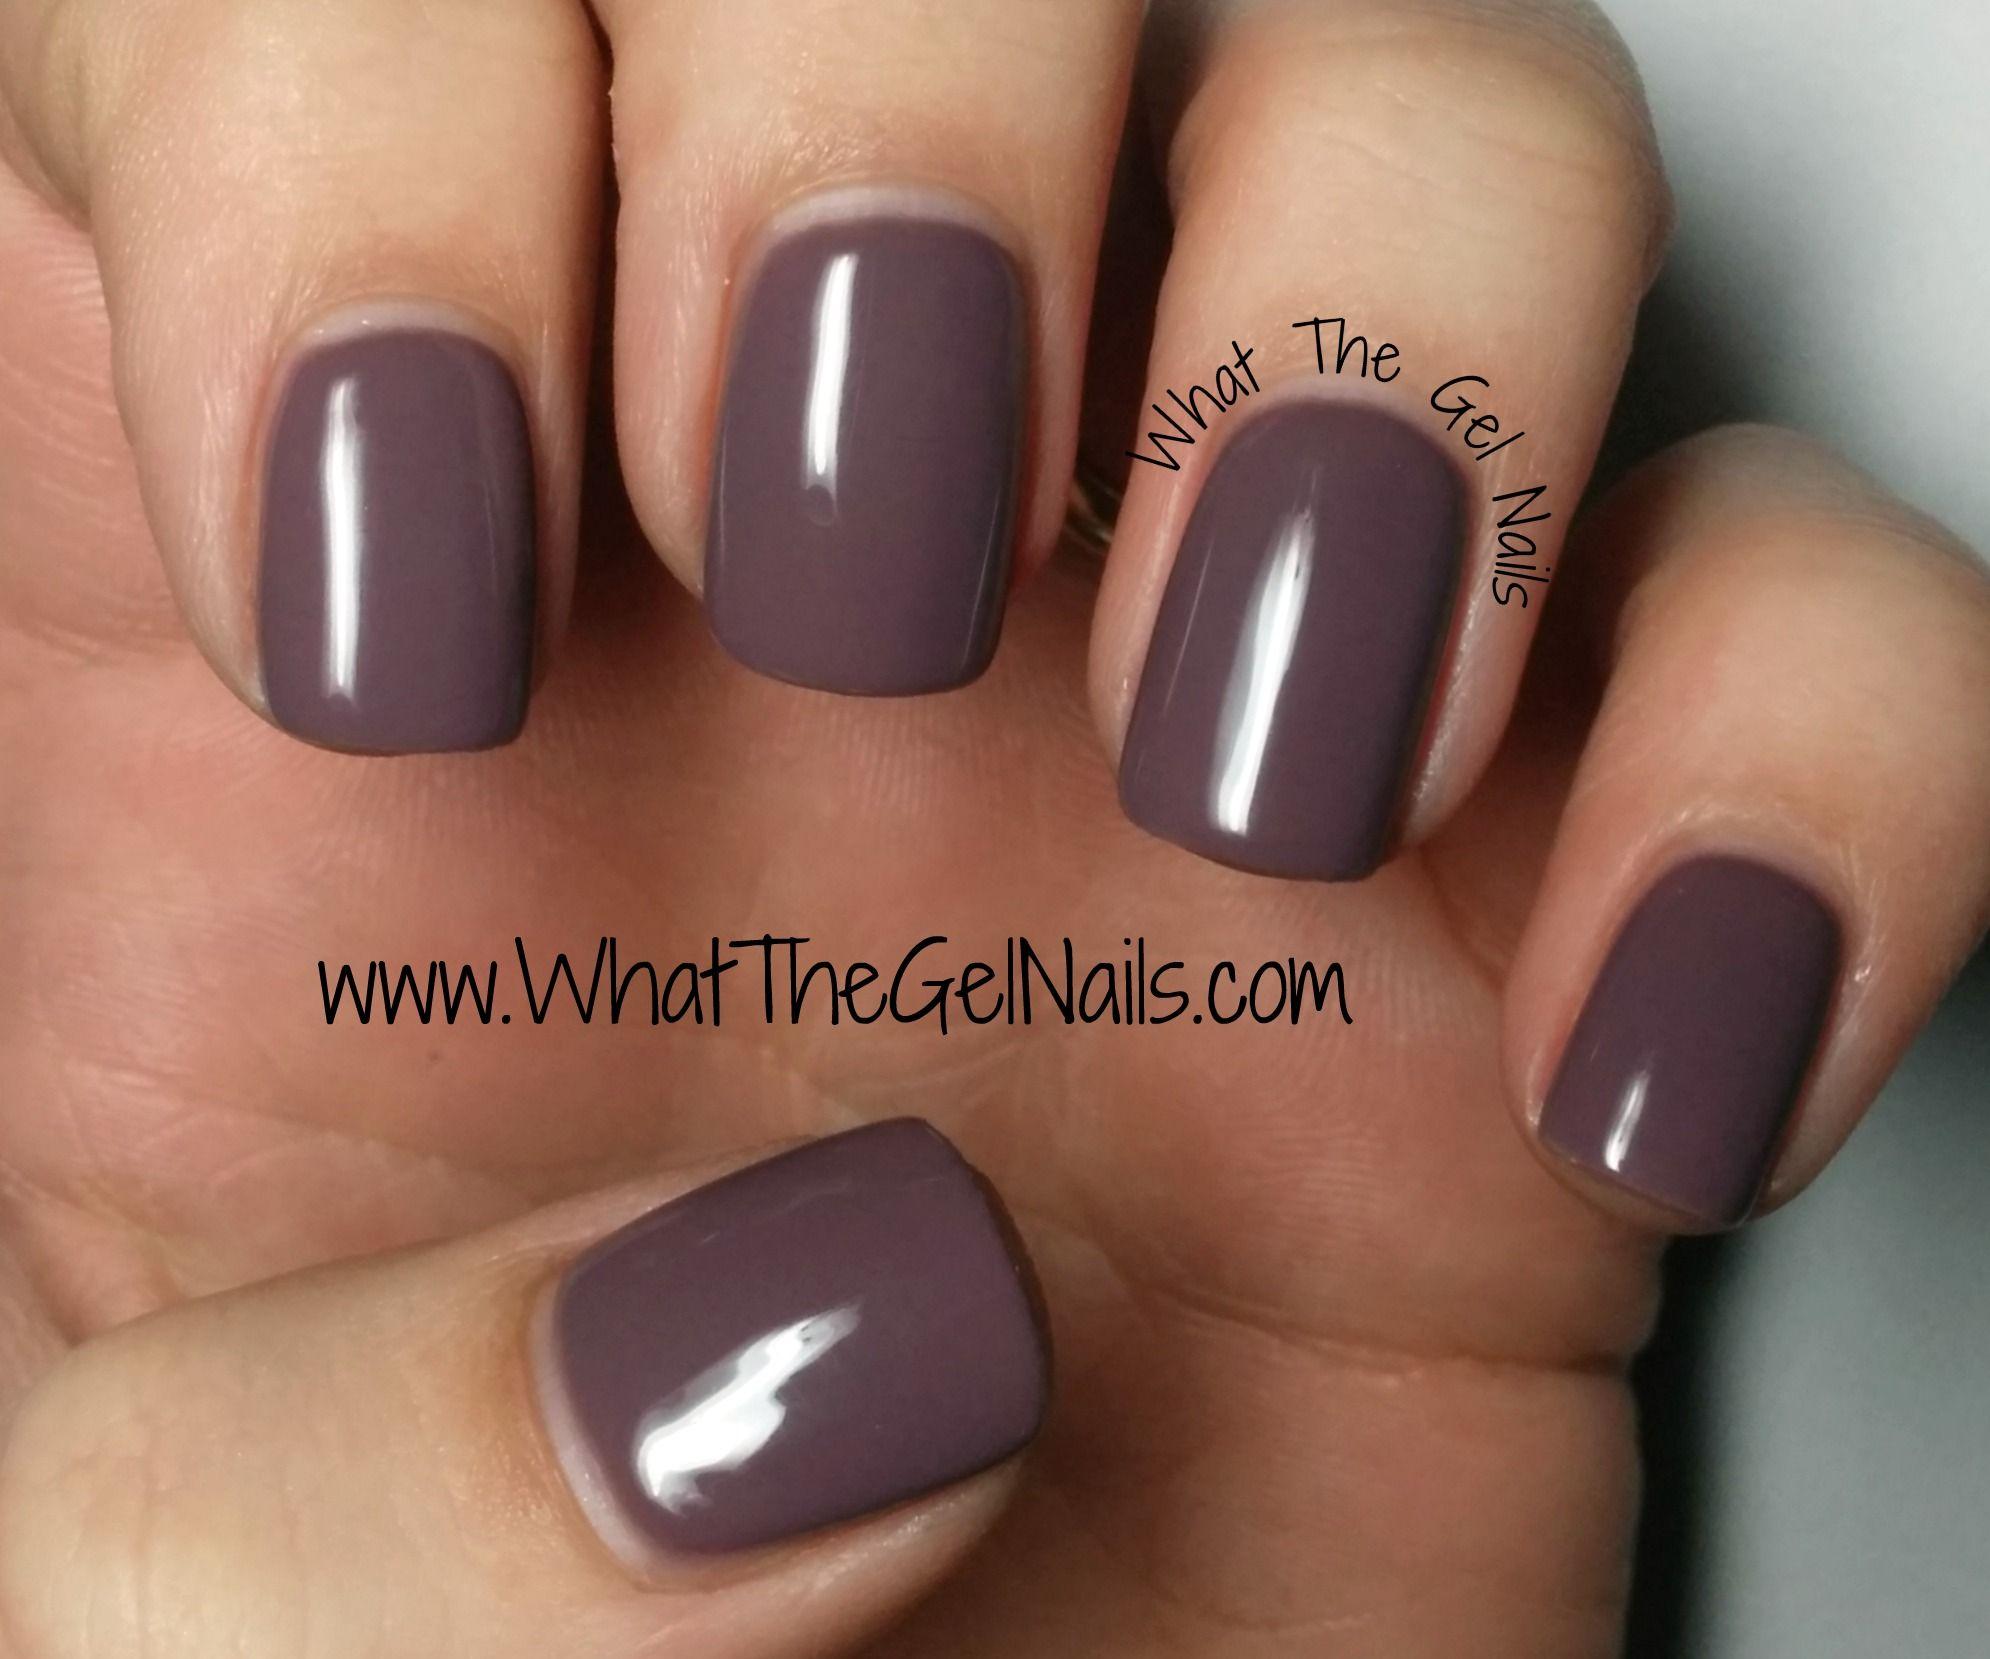 Ibd smokey plum plus more ibd just gel colors nails pinterest